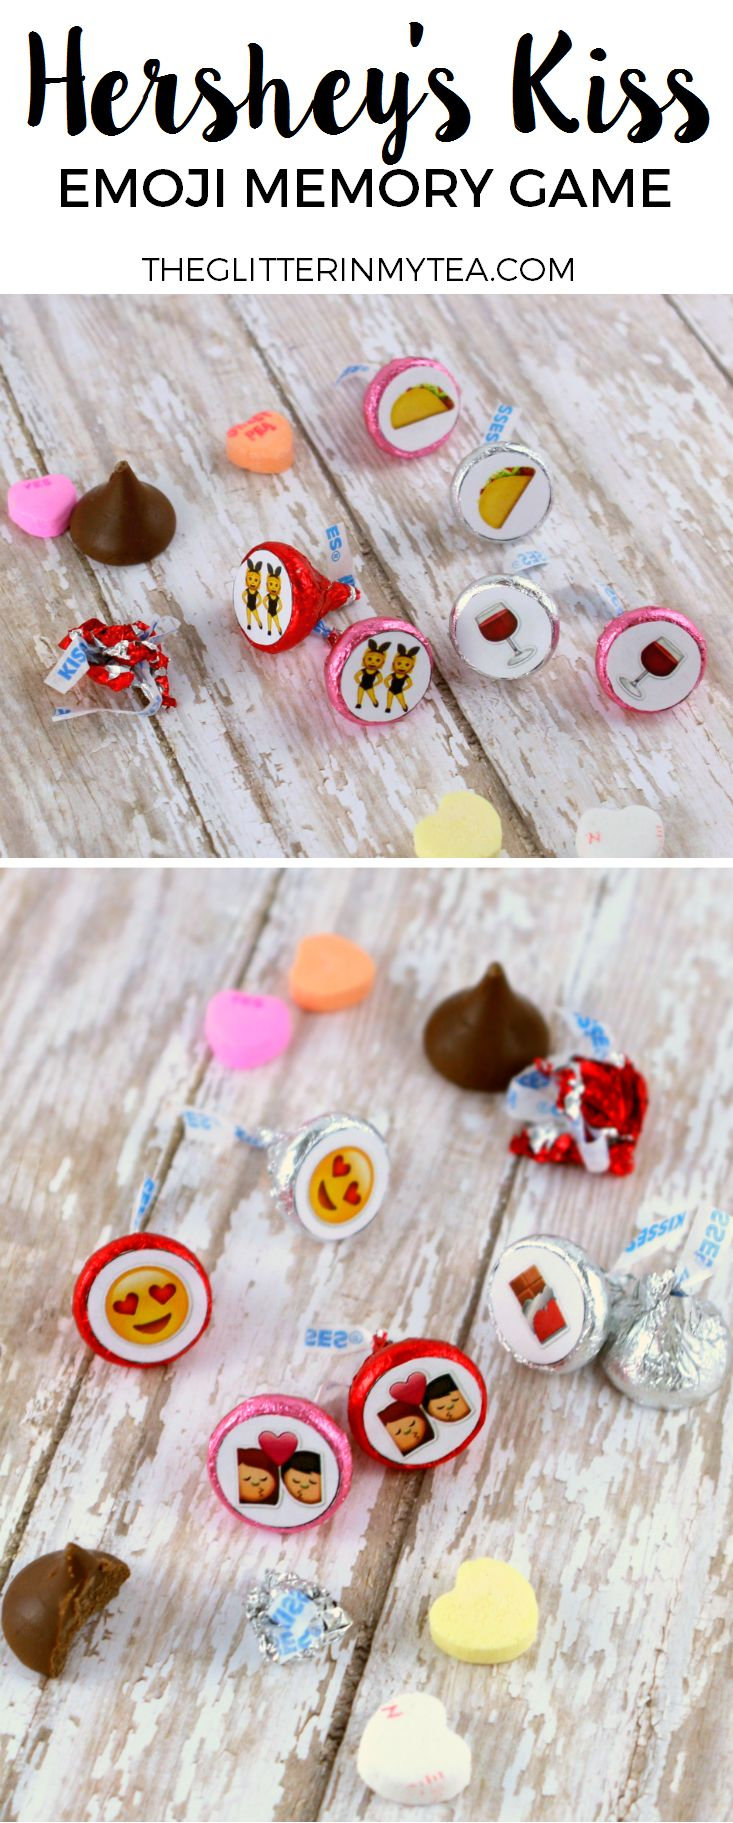 DIY Hershey Kiss Emoji Memory Game Valentine's day party